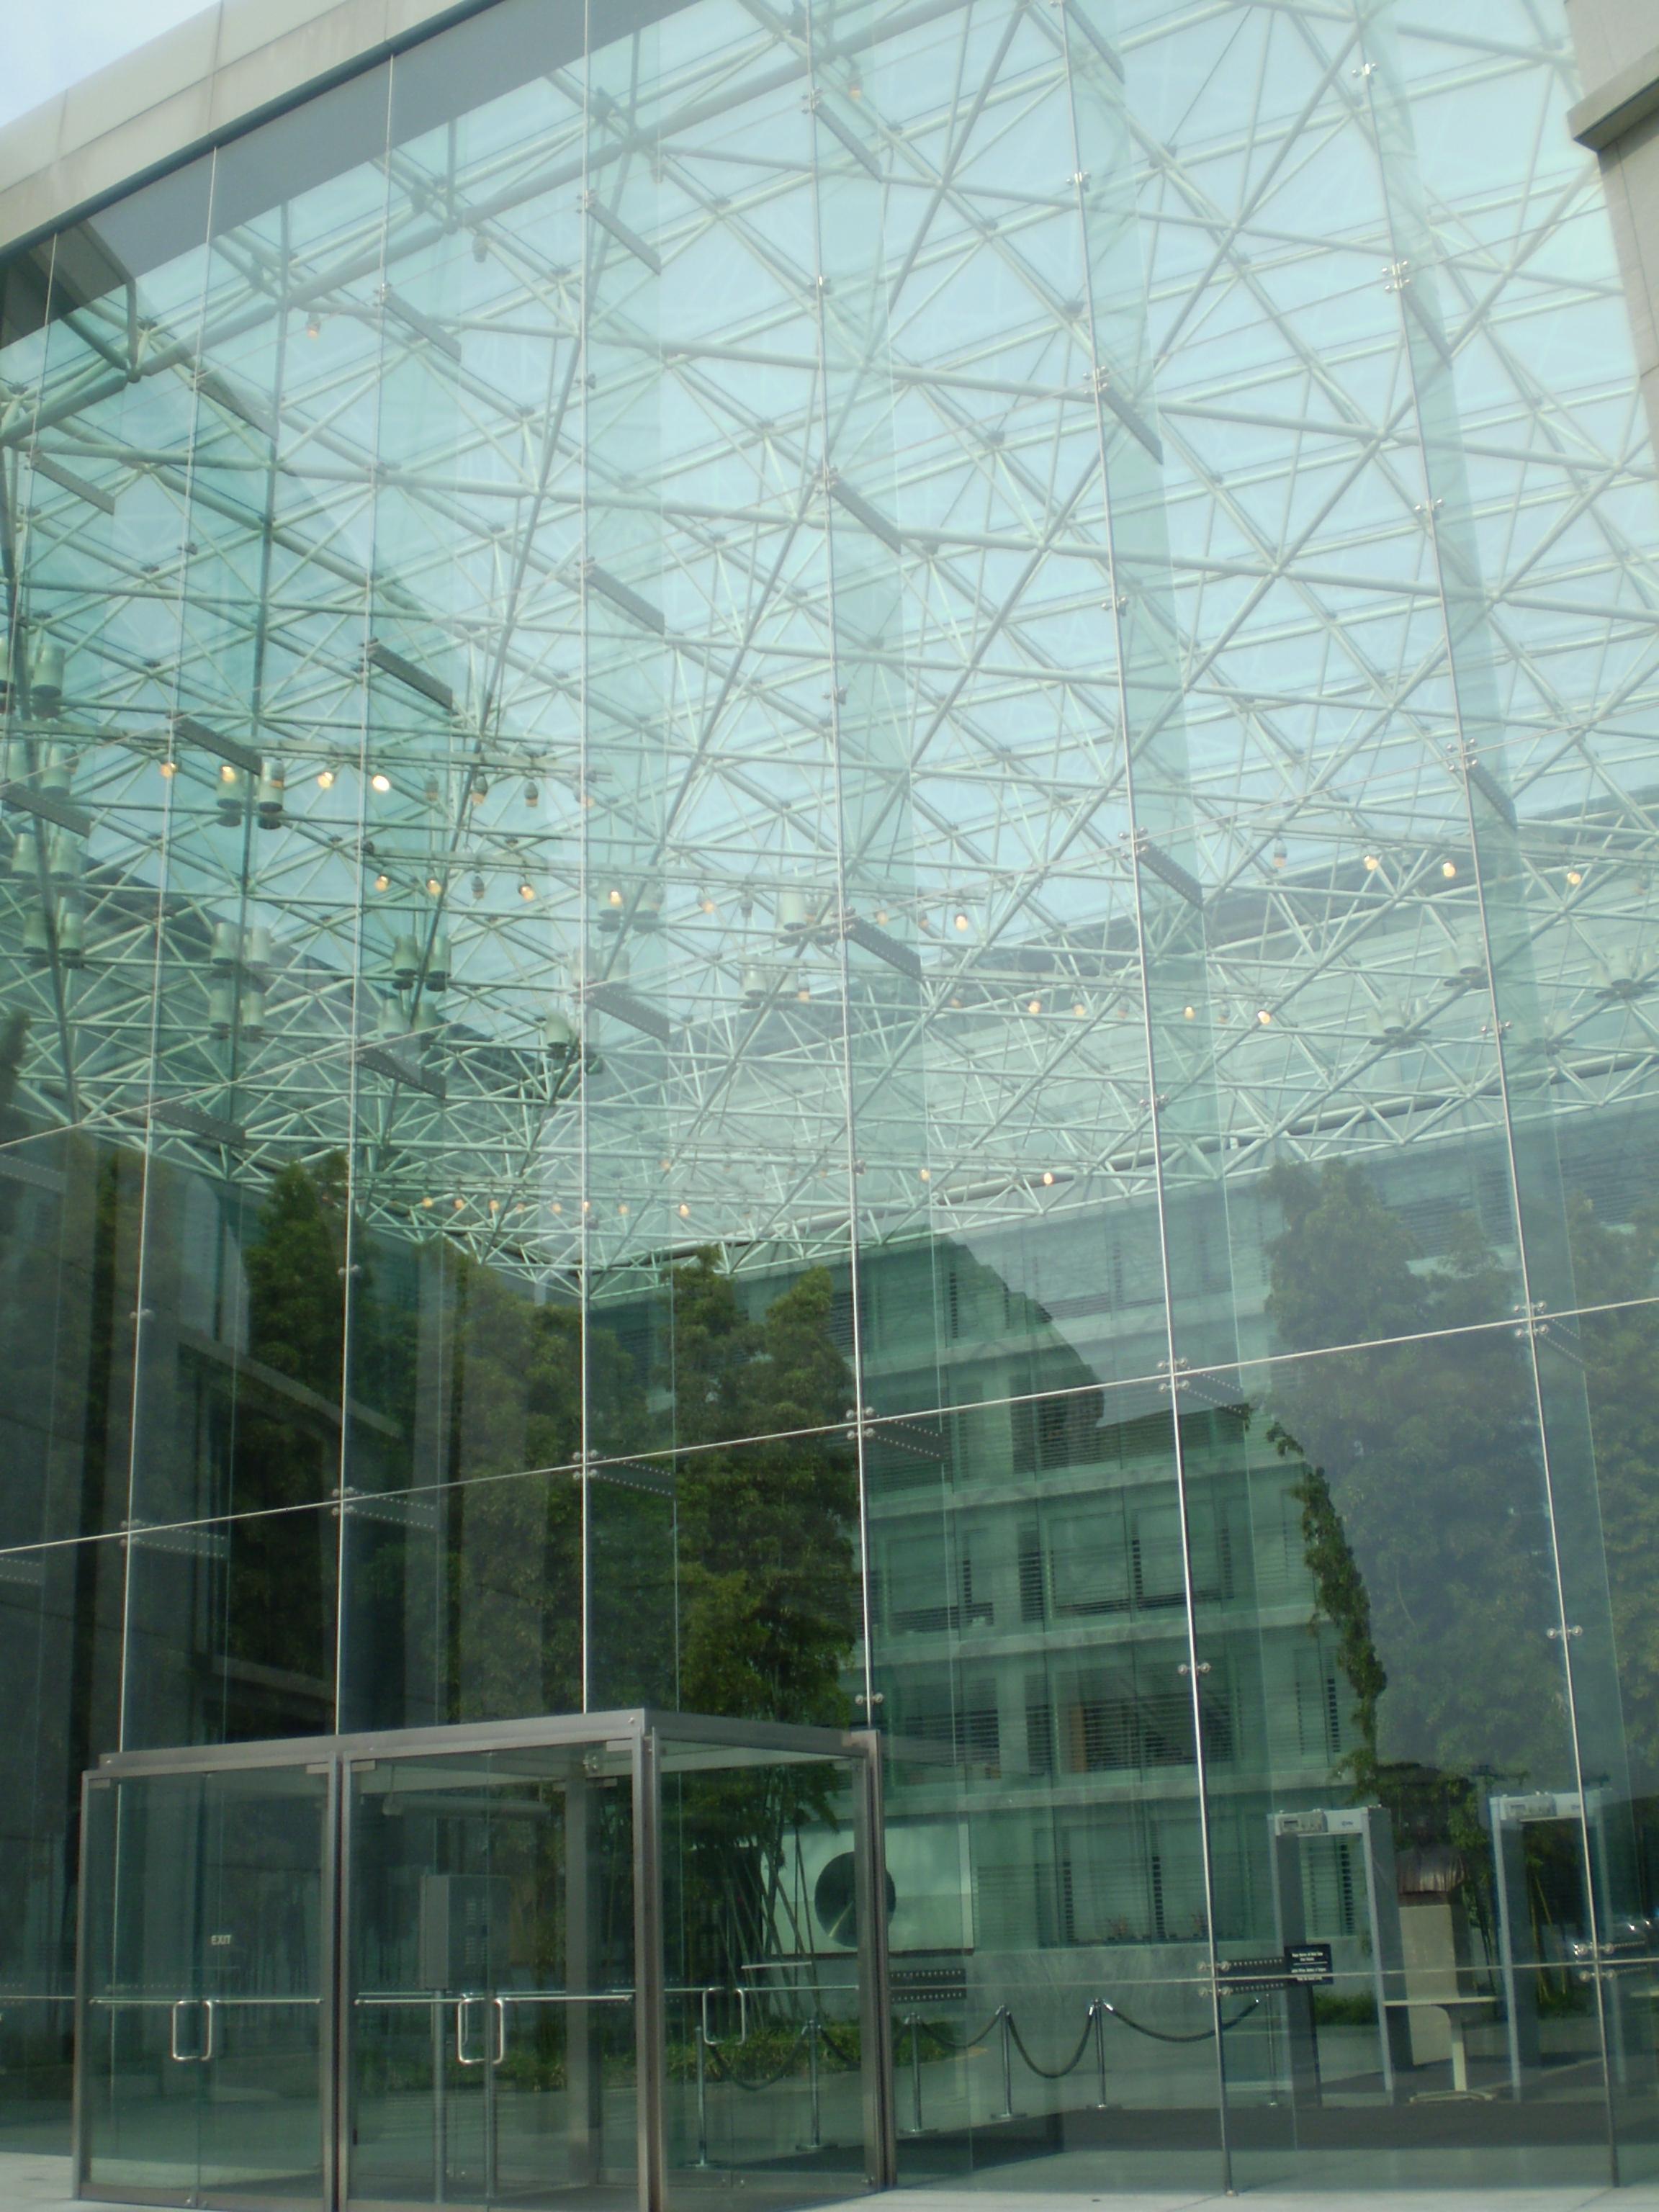 Thurgood_Marshall_Federal_Judiciary_Building_glass.JPG